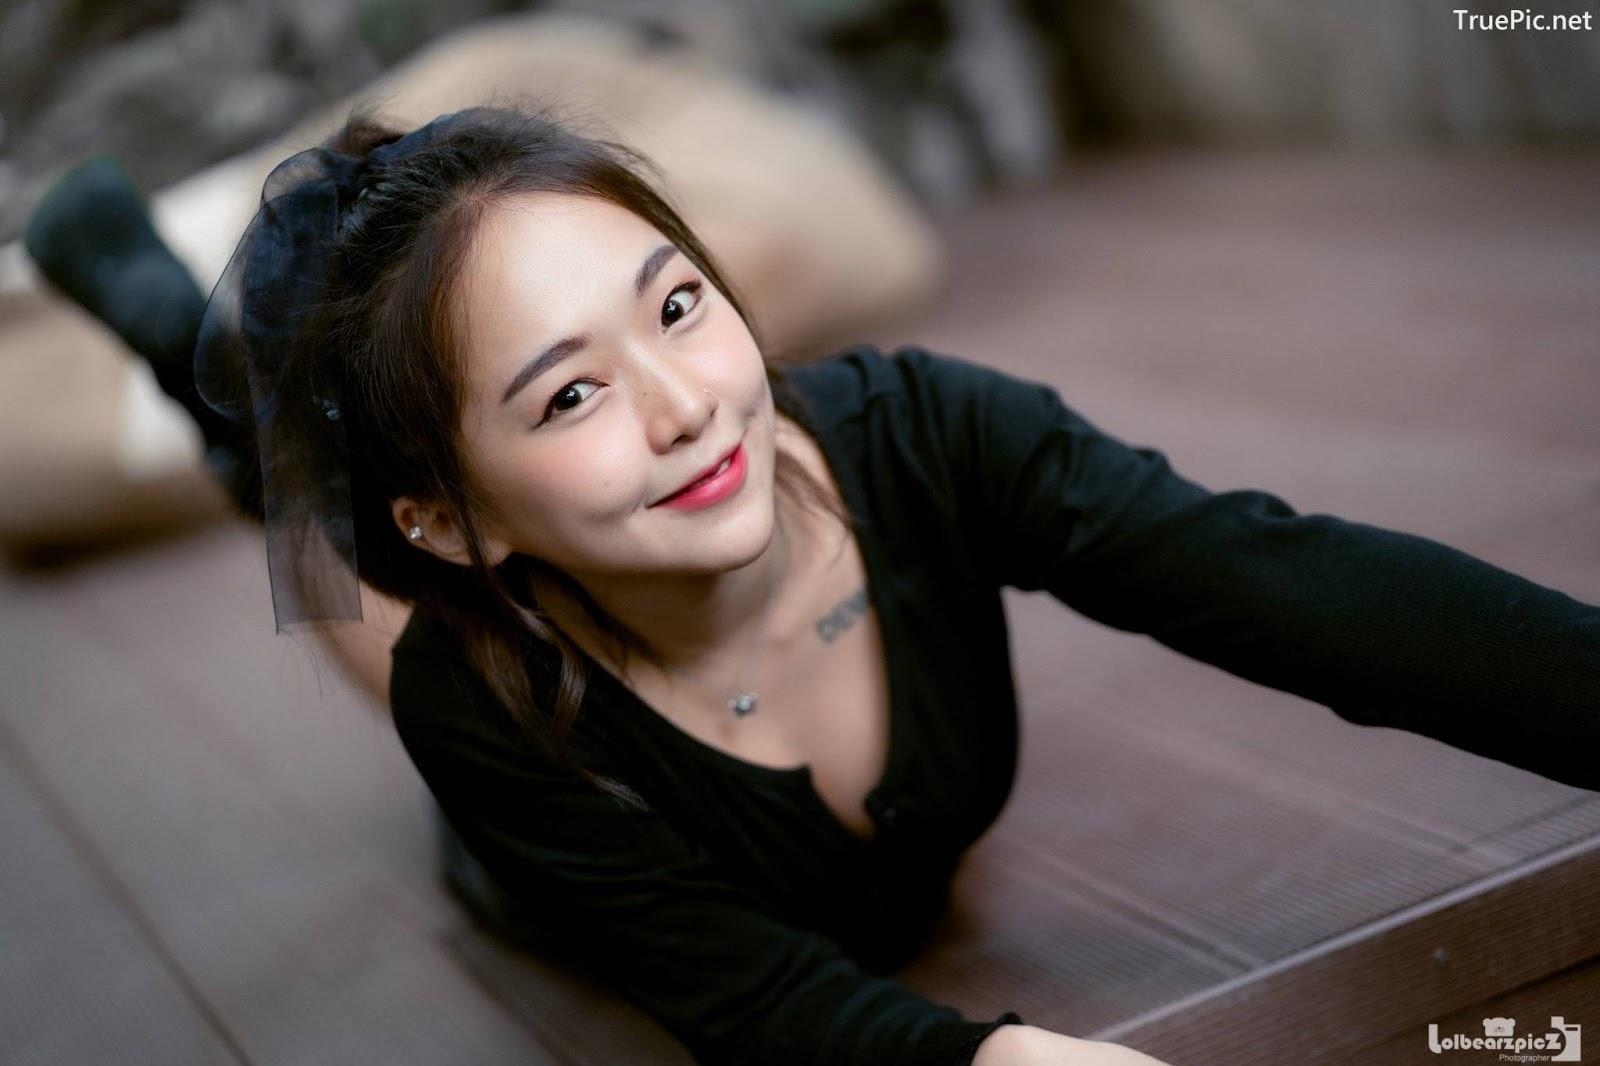 Image Thailand Model - Sunna Dewa - Cute Naughty Girl - TruePic.net - Picture-5